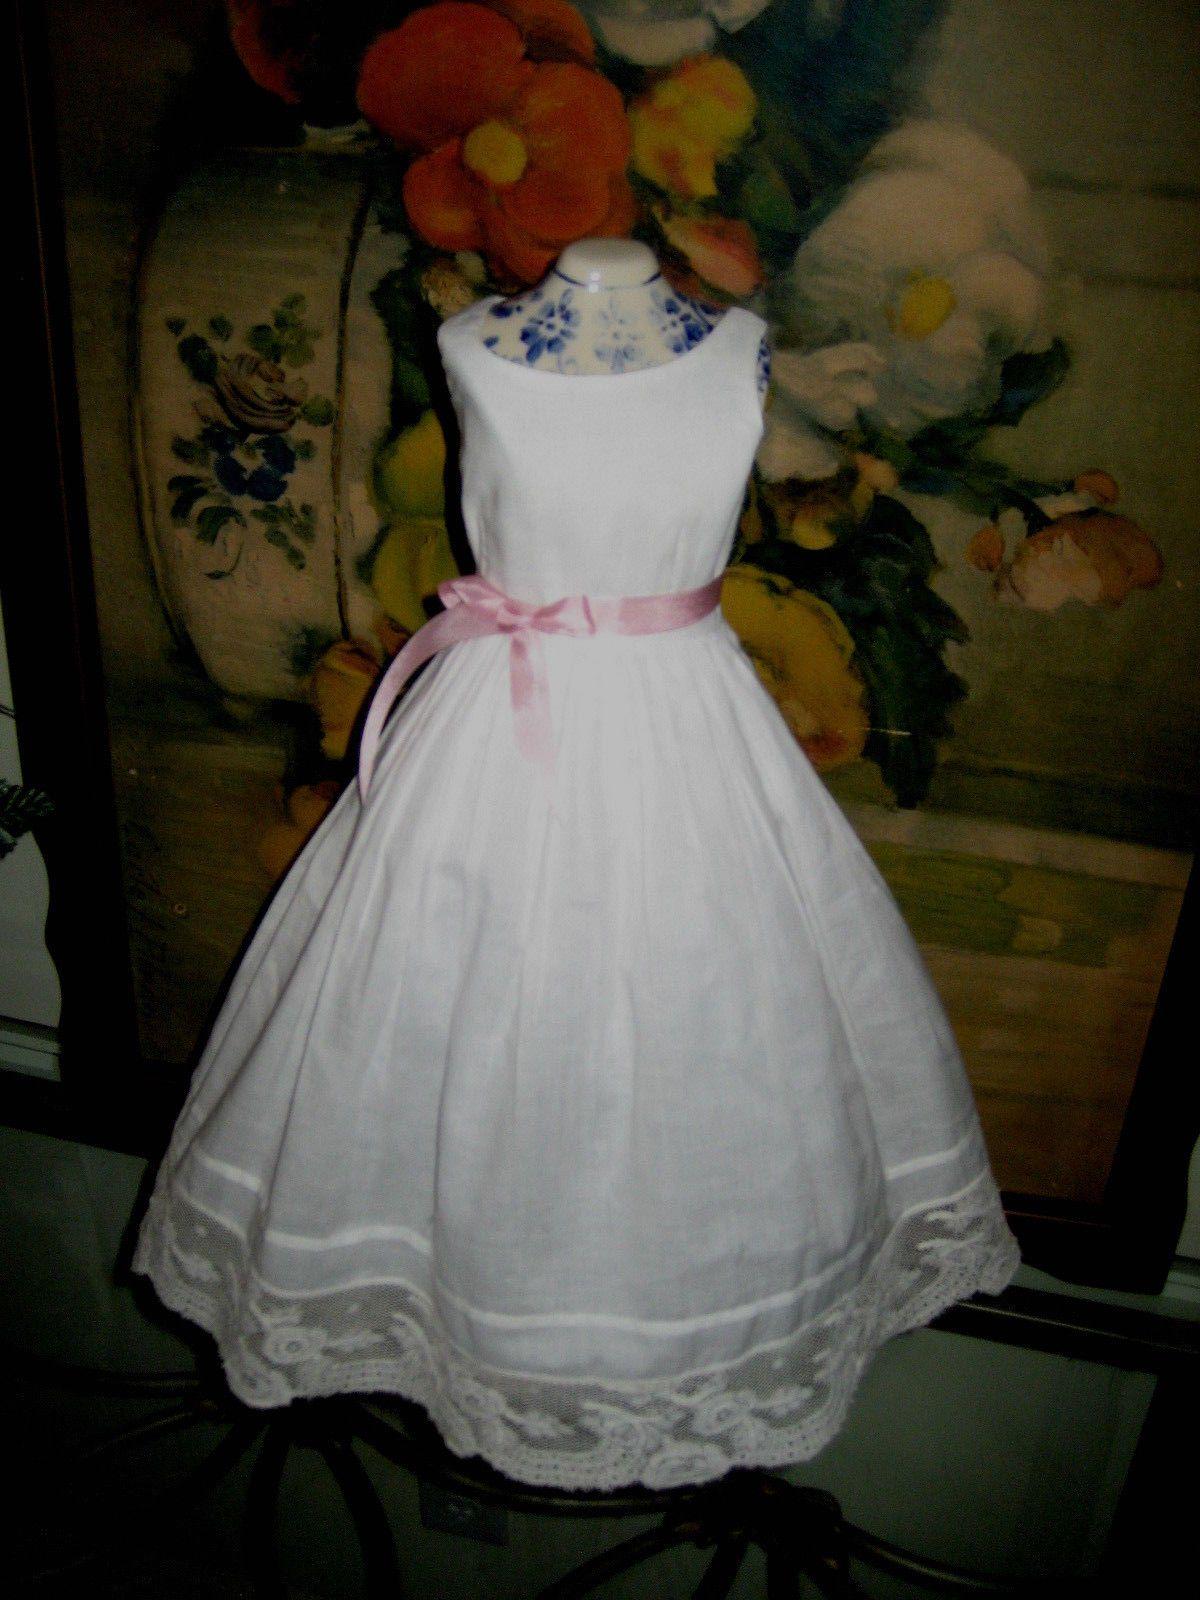 https://www.ebay.com/itm/17-ANTIQUE-VTG-FRENCH-FASHION-DOLL-LADY-BODY-FULL-SLIP-GERMAN-BISQUE-HEAD-RIVET/292386186584?hash=item4413932558:g:pMoAAOSwUn9aA3tI